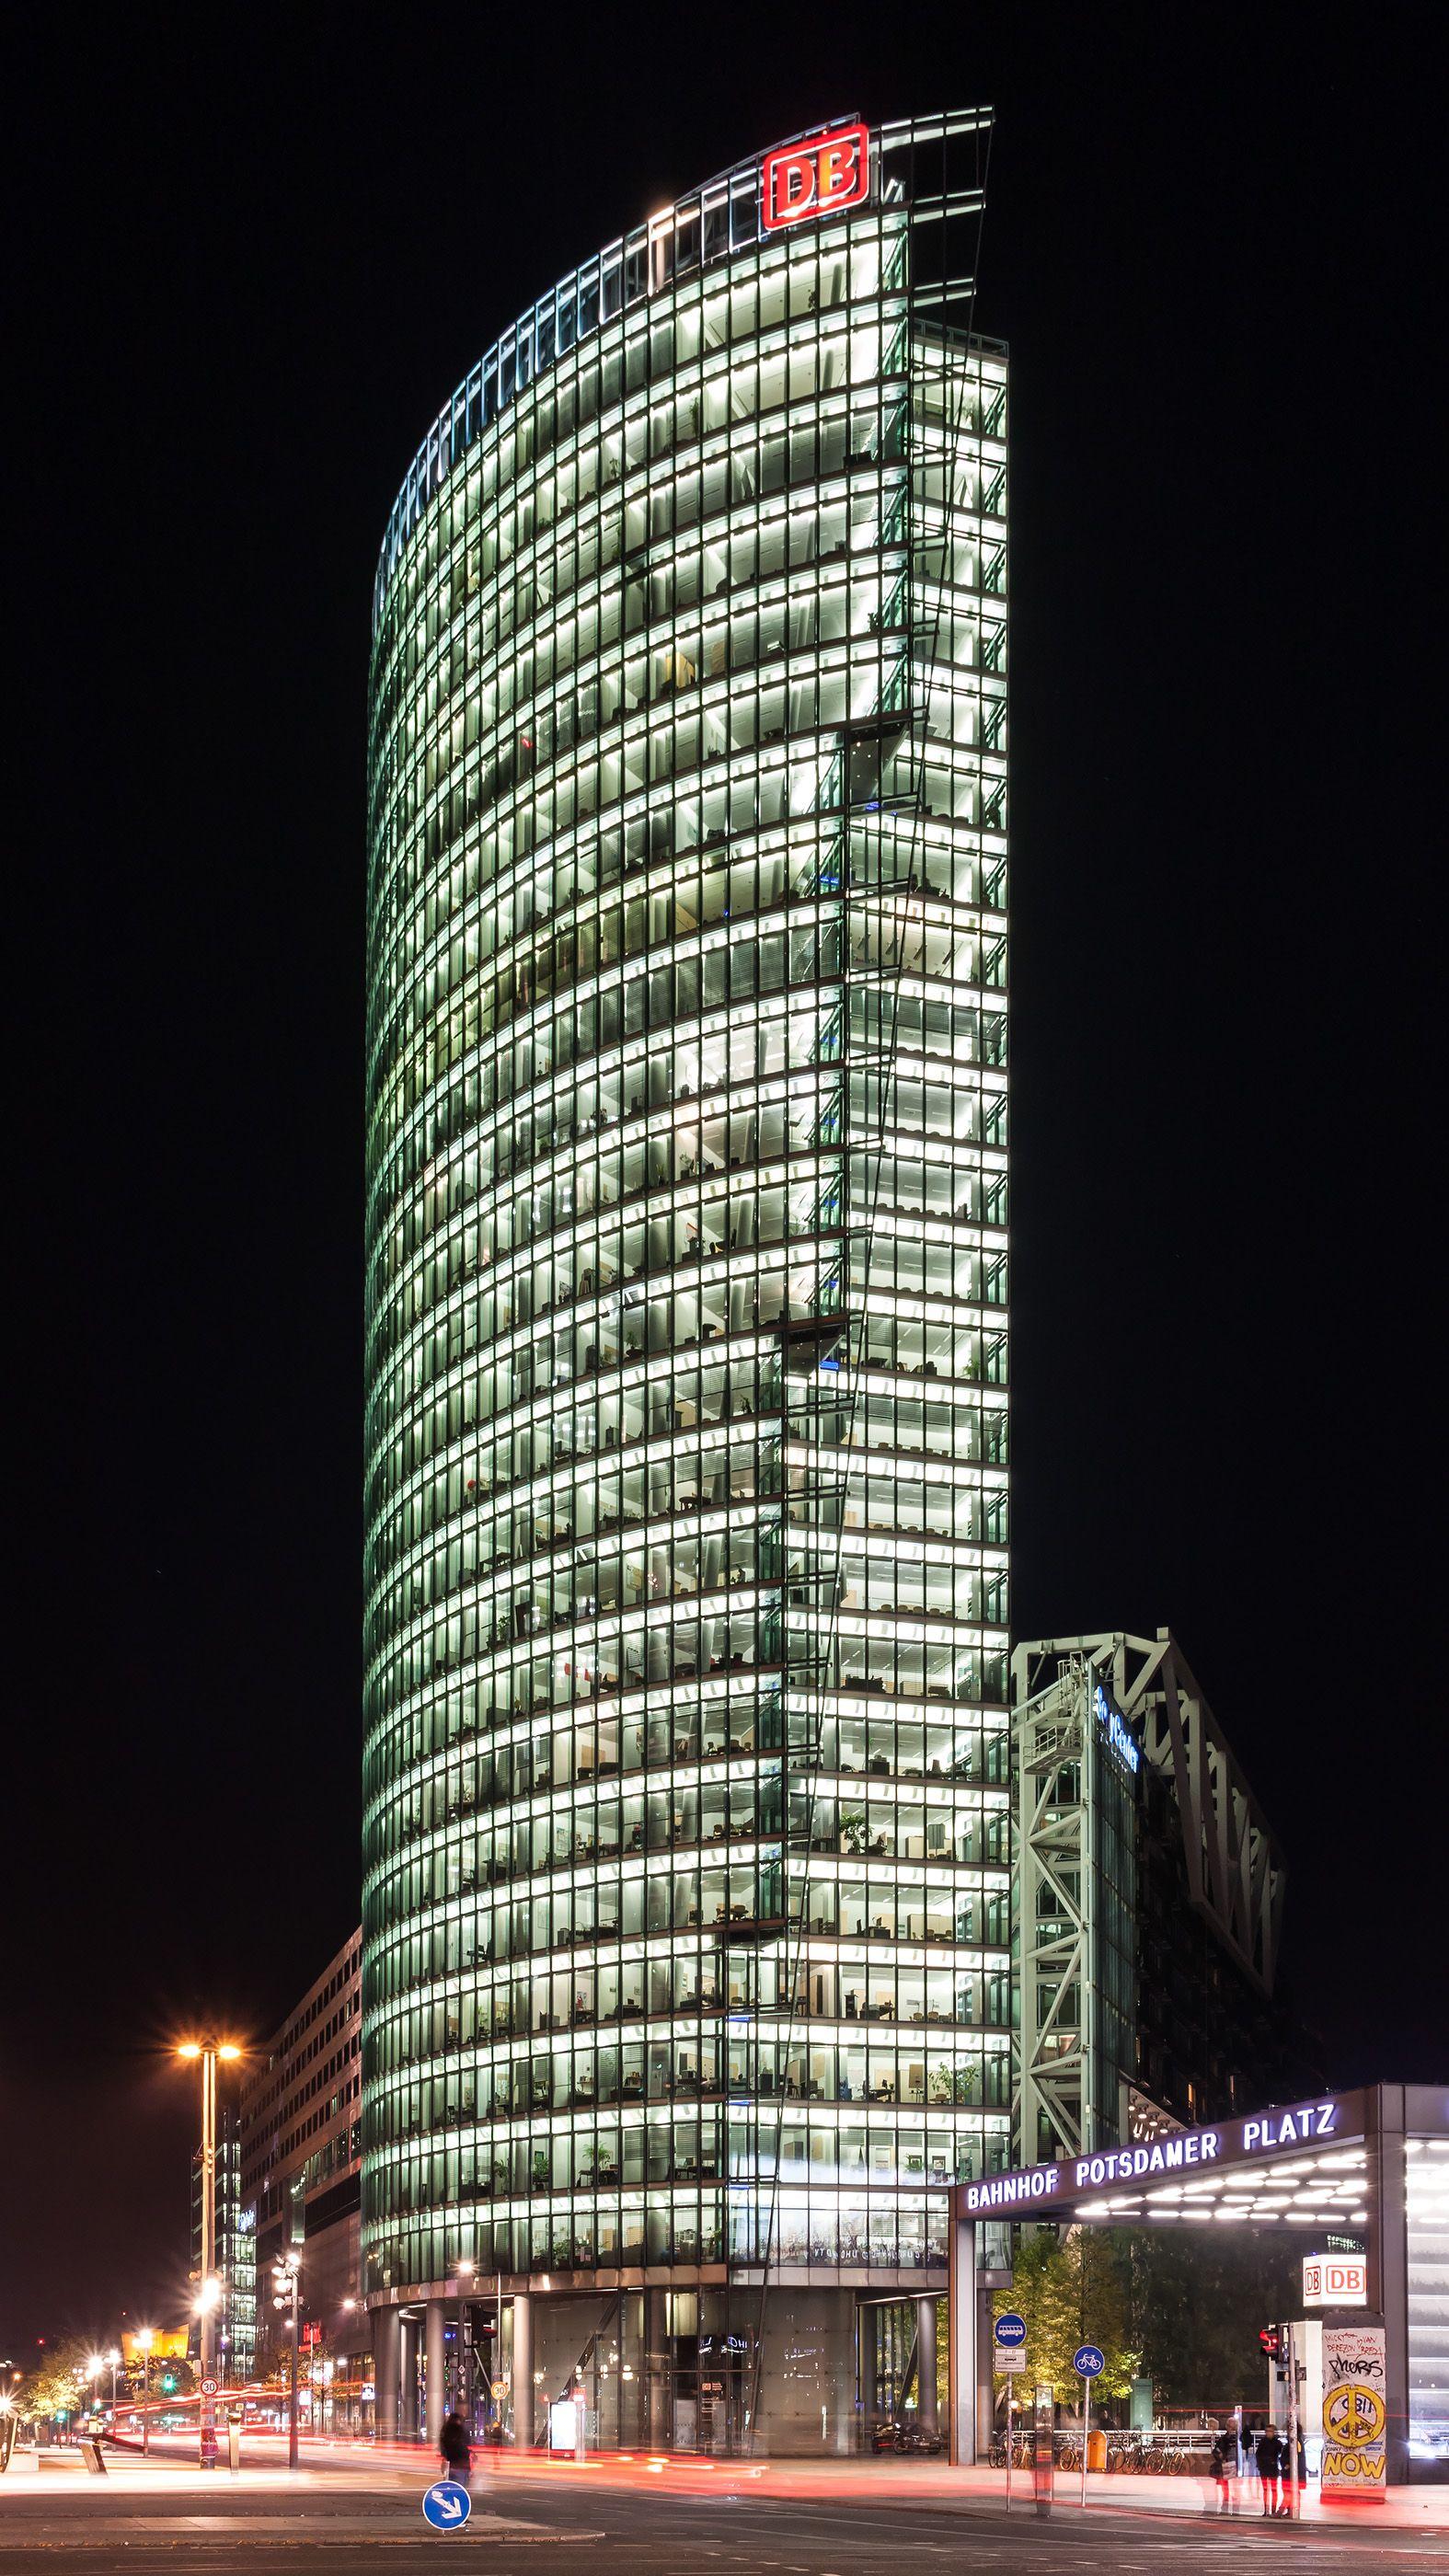 Helmut Jahn Architects DB Bahntower, Potsdamer Platz